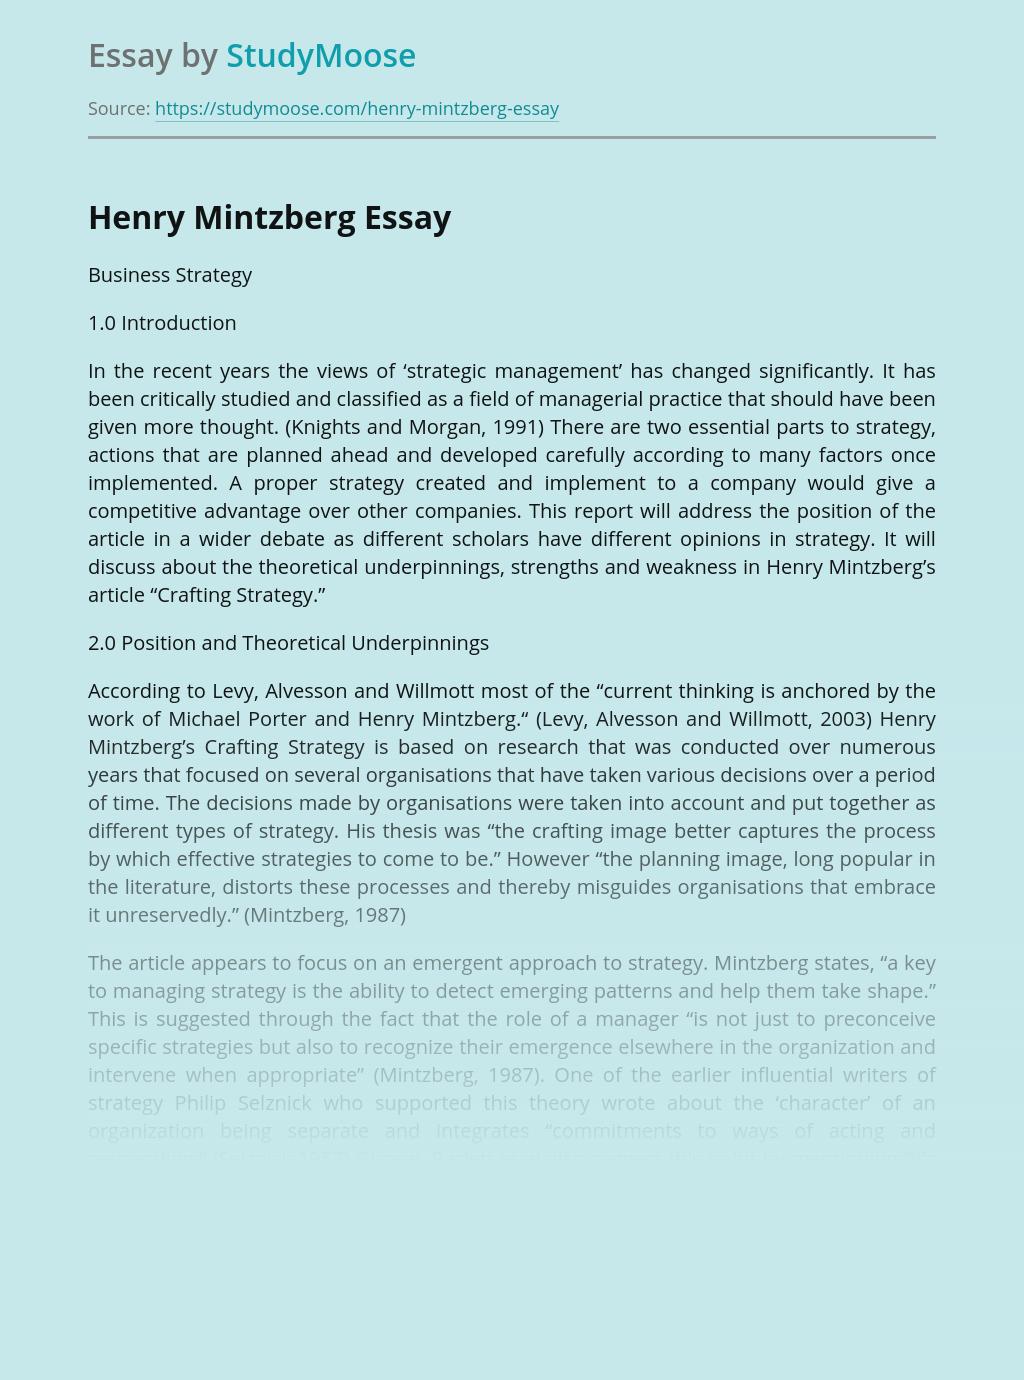 Henry Mintzberg